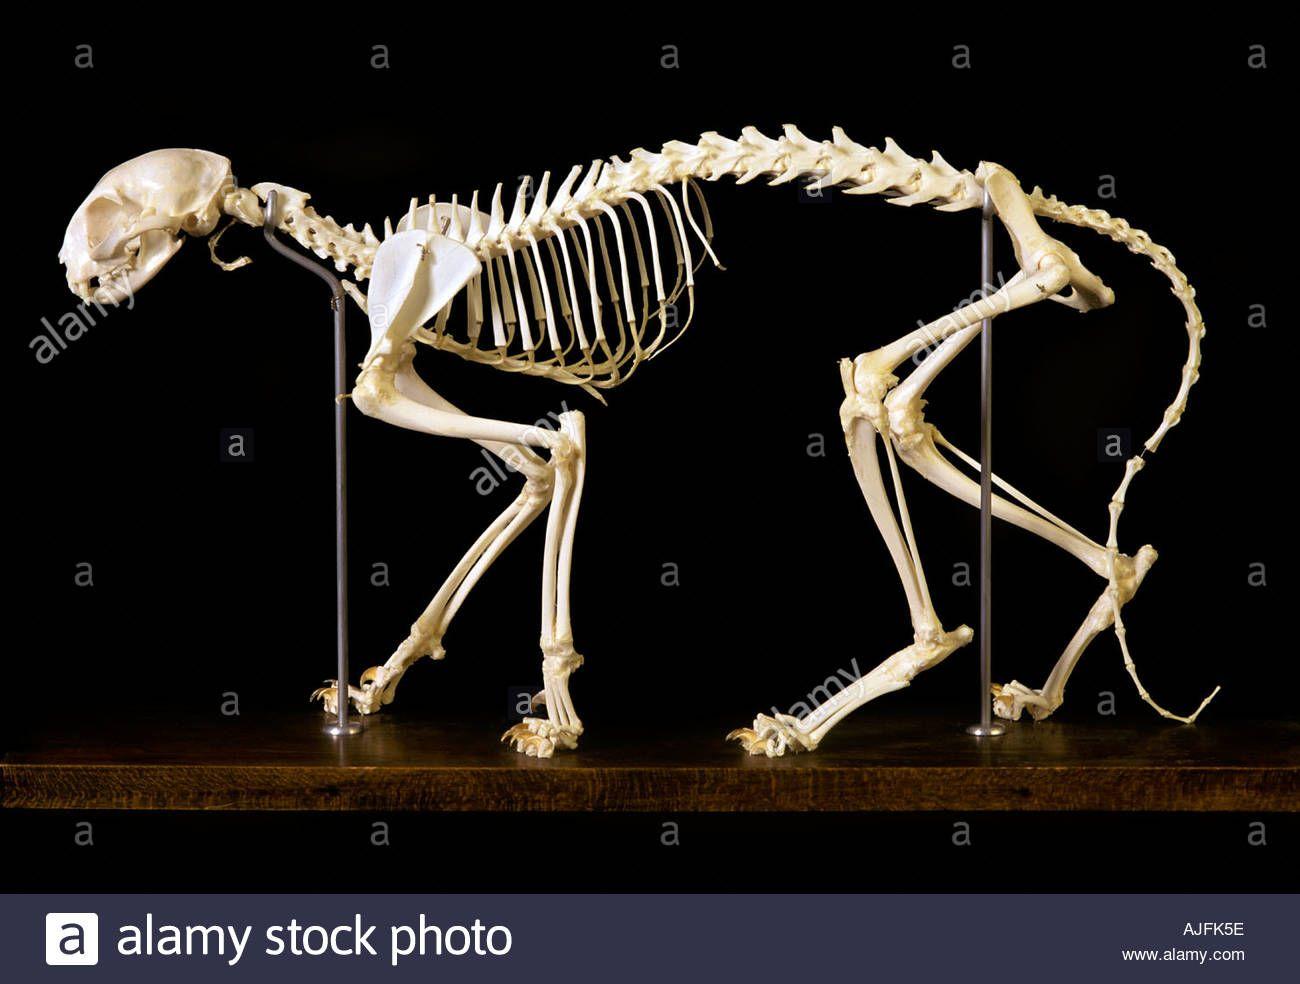 Katze Skelett Felis domestica Stockfoto | ZOO | Pinterest | Zoos